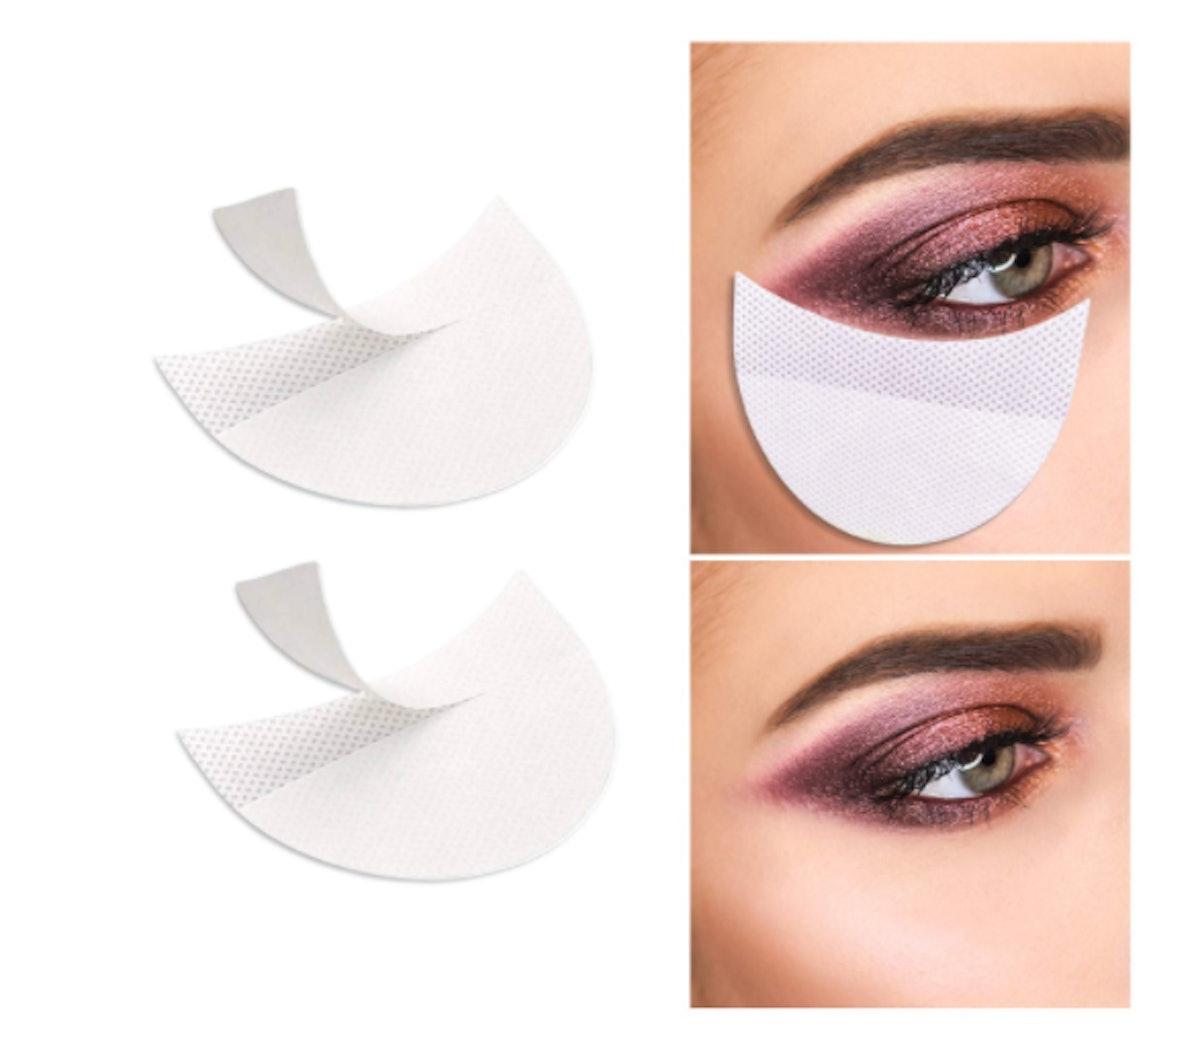 Veeyol Eyeshadow Pad Stencils (100 Pcs)